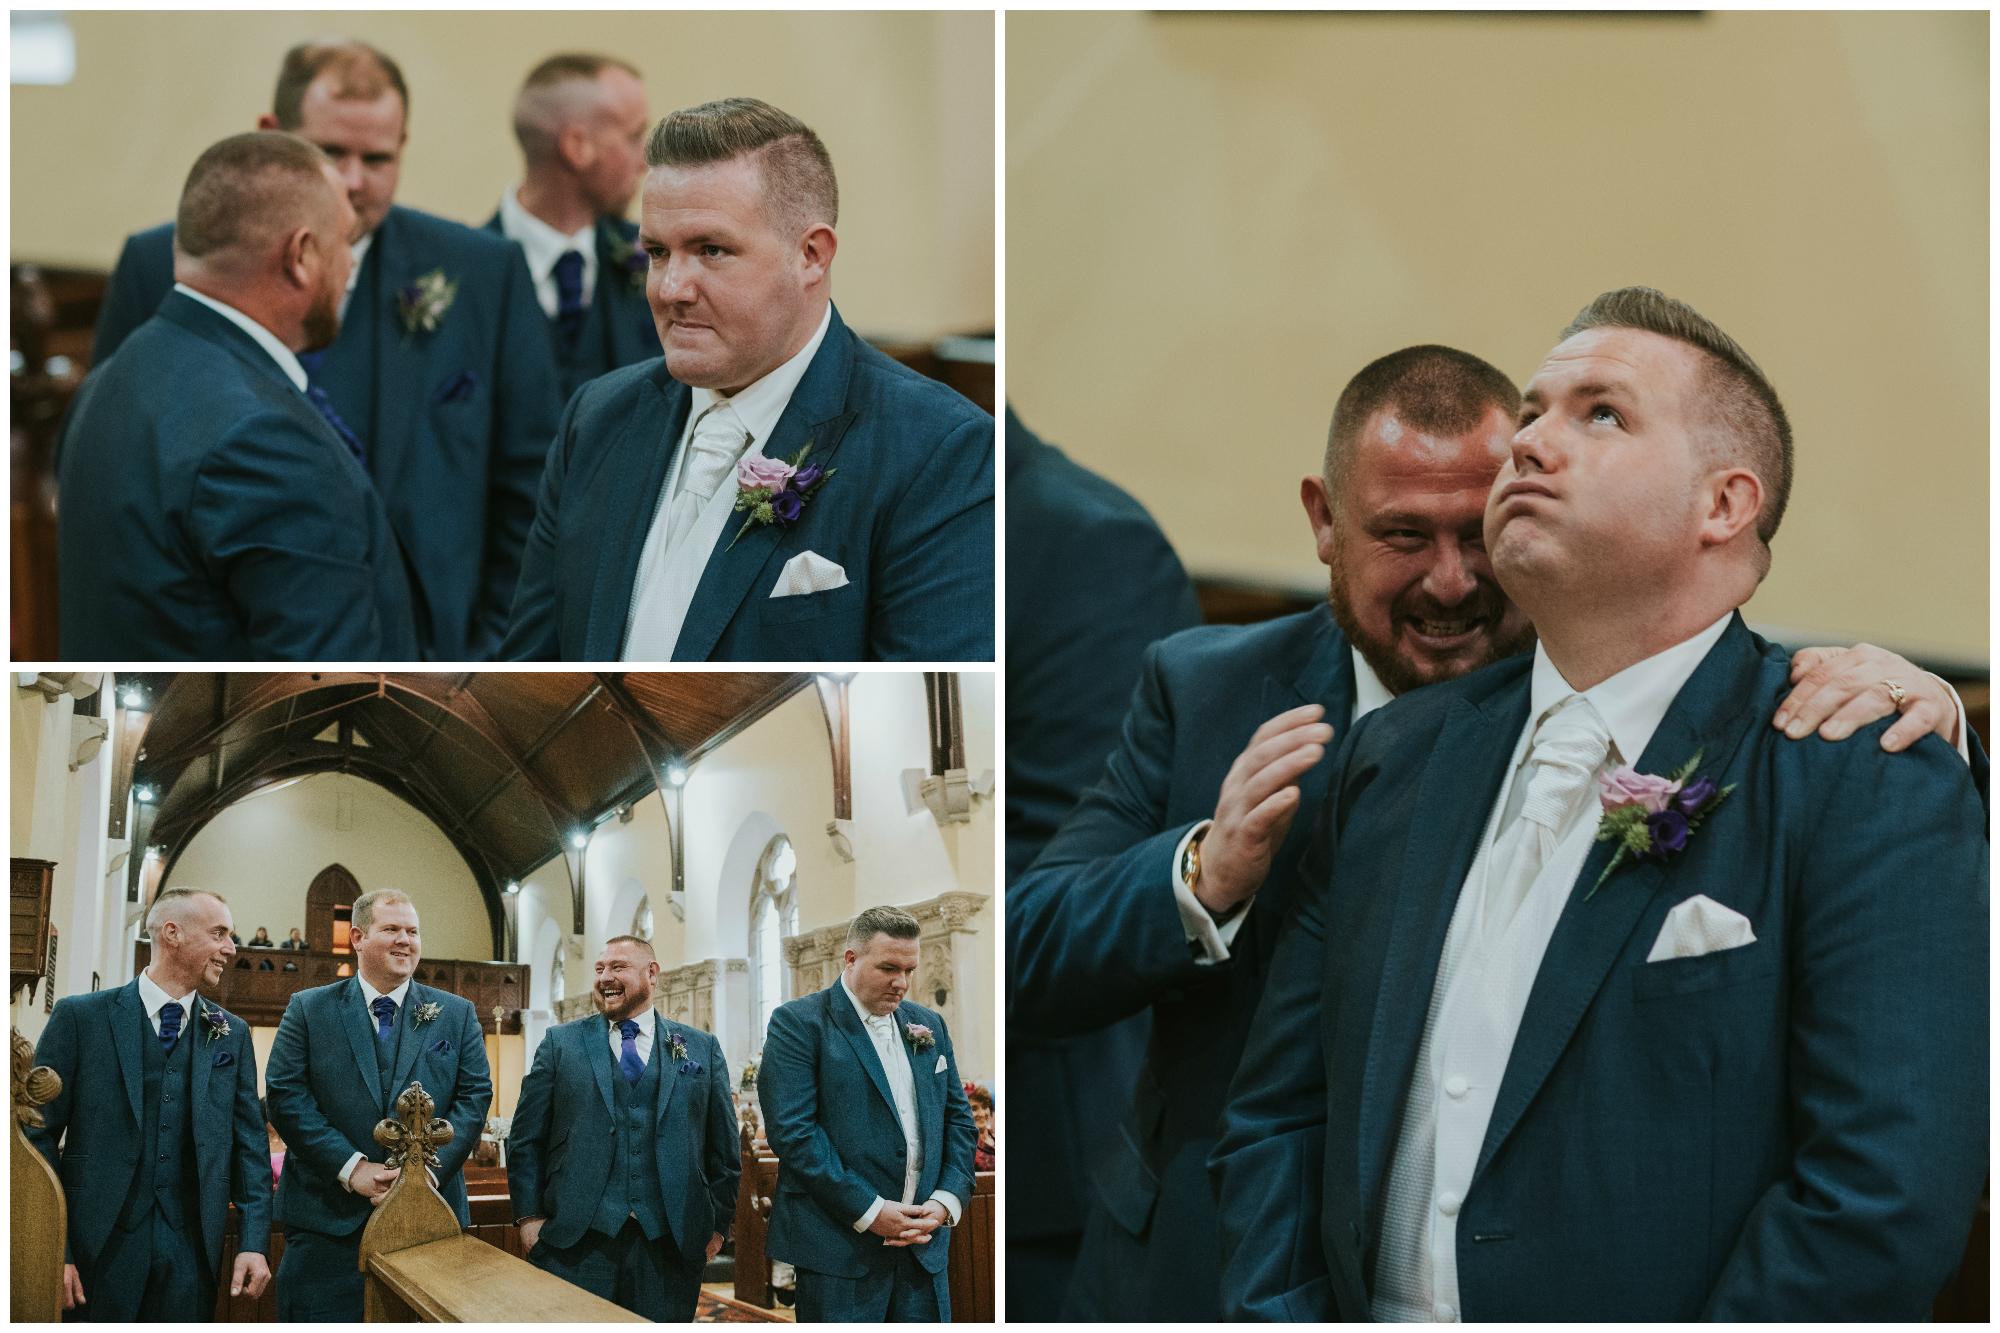 Christ Church Limavady wedding photographer Pure Photo N.I nervous groom